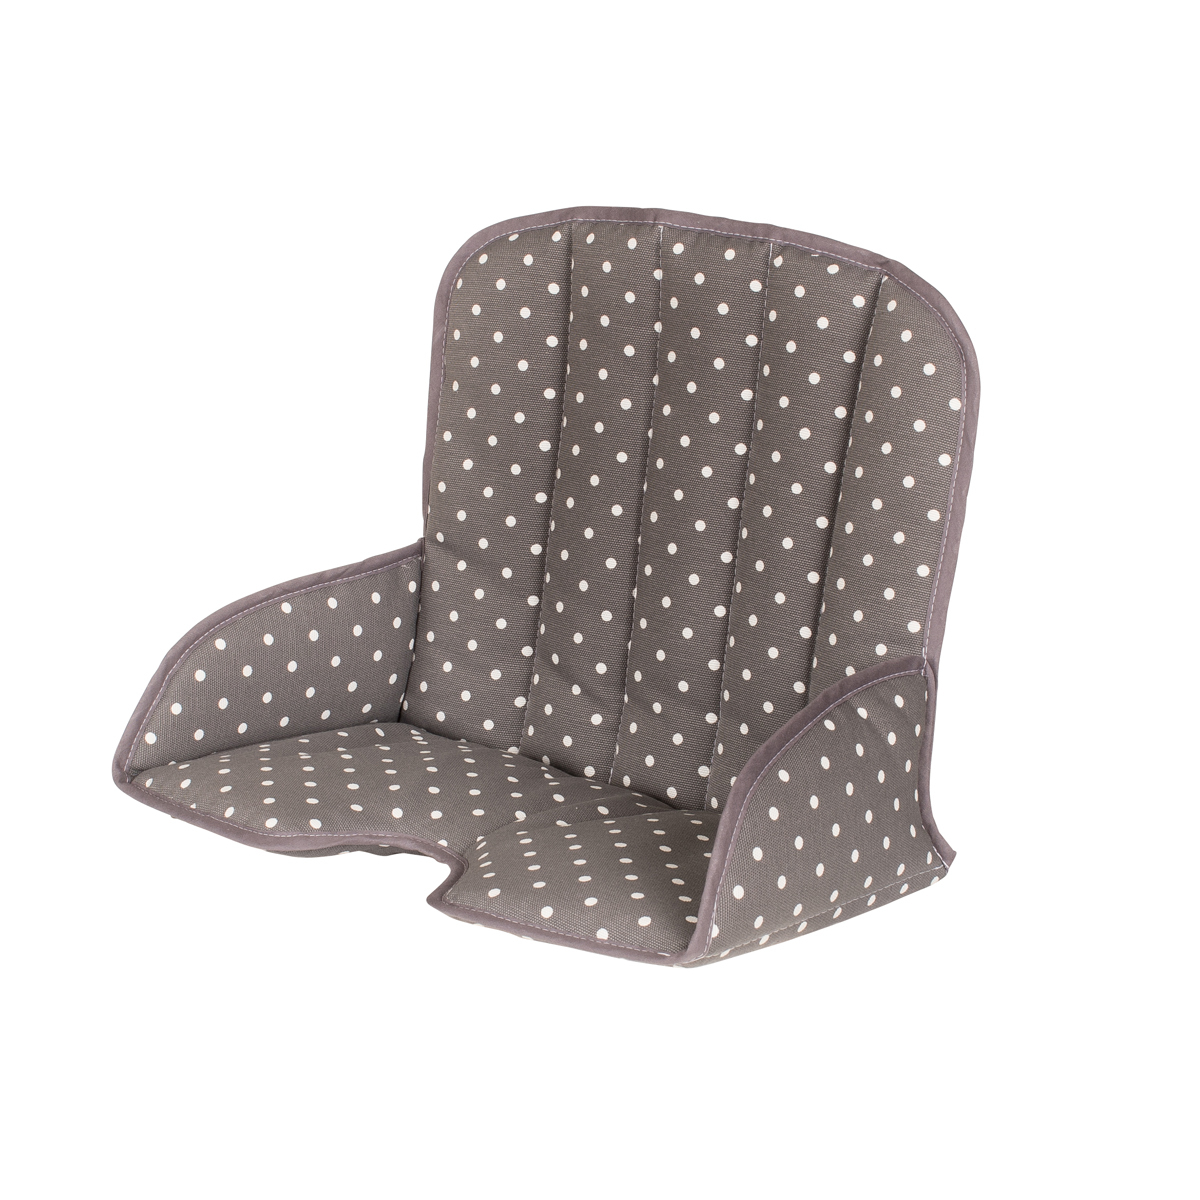 geuther ensemble chaise haute tamino tablette coussin de chaise blanc chaise haute. Black Bedroom Furniture Sets. Home Design Ideas